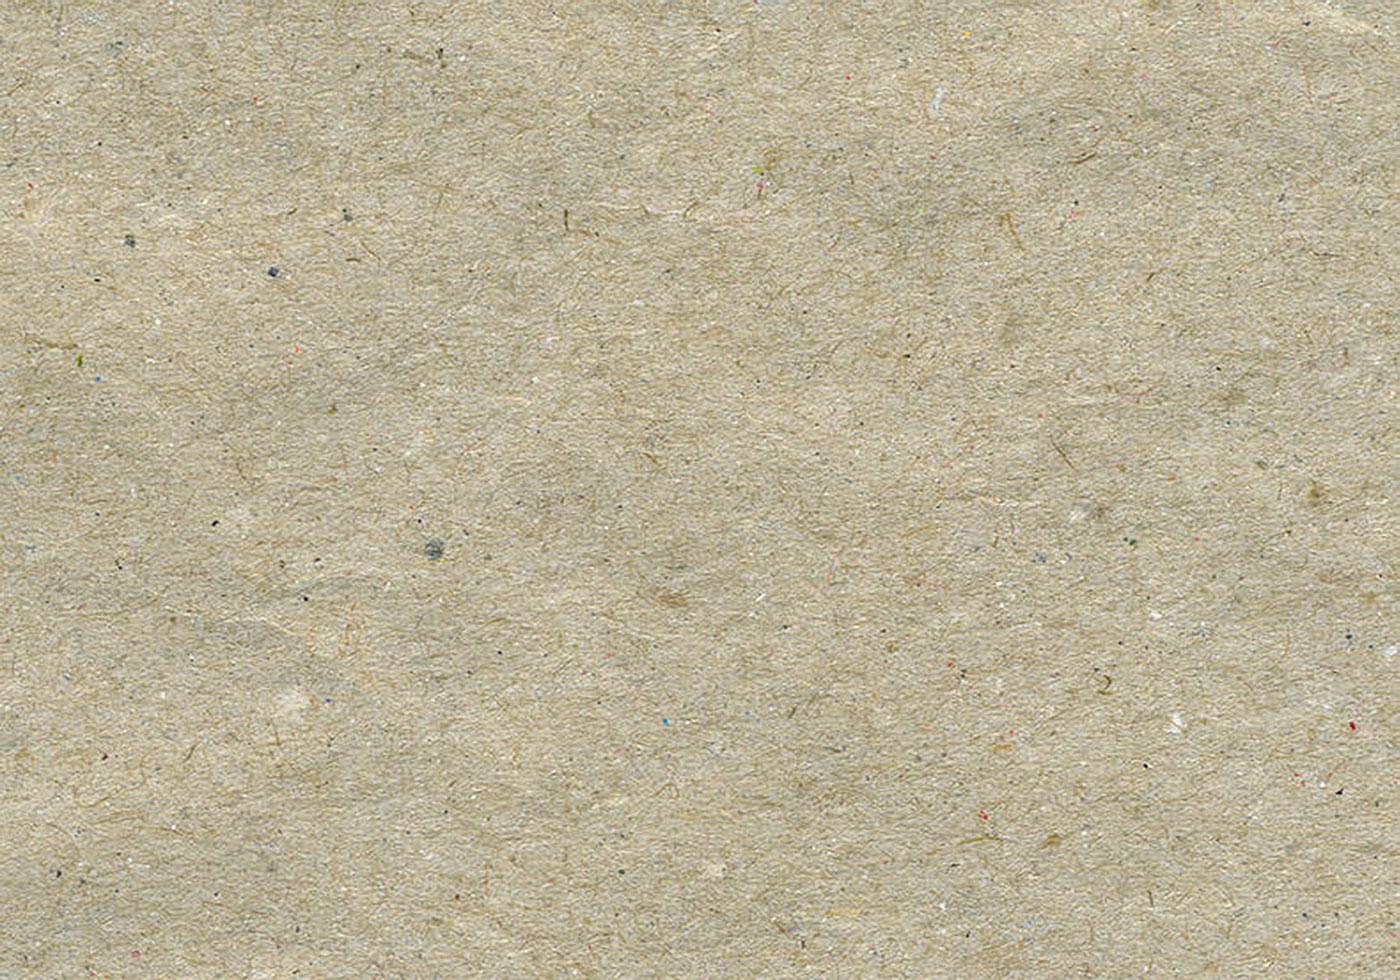 Coarse Fibrous Brown Paper Texture Free Photoshop